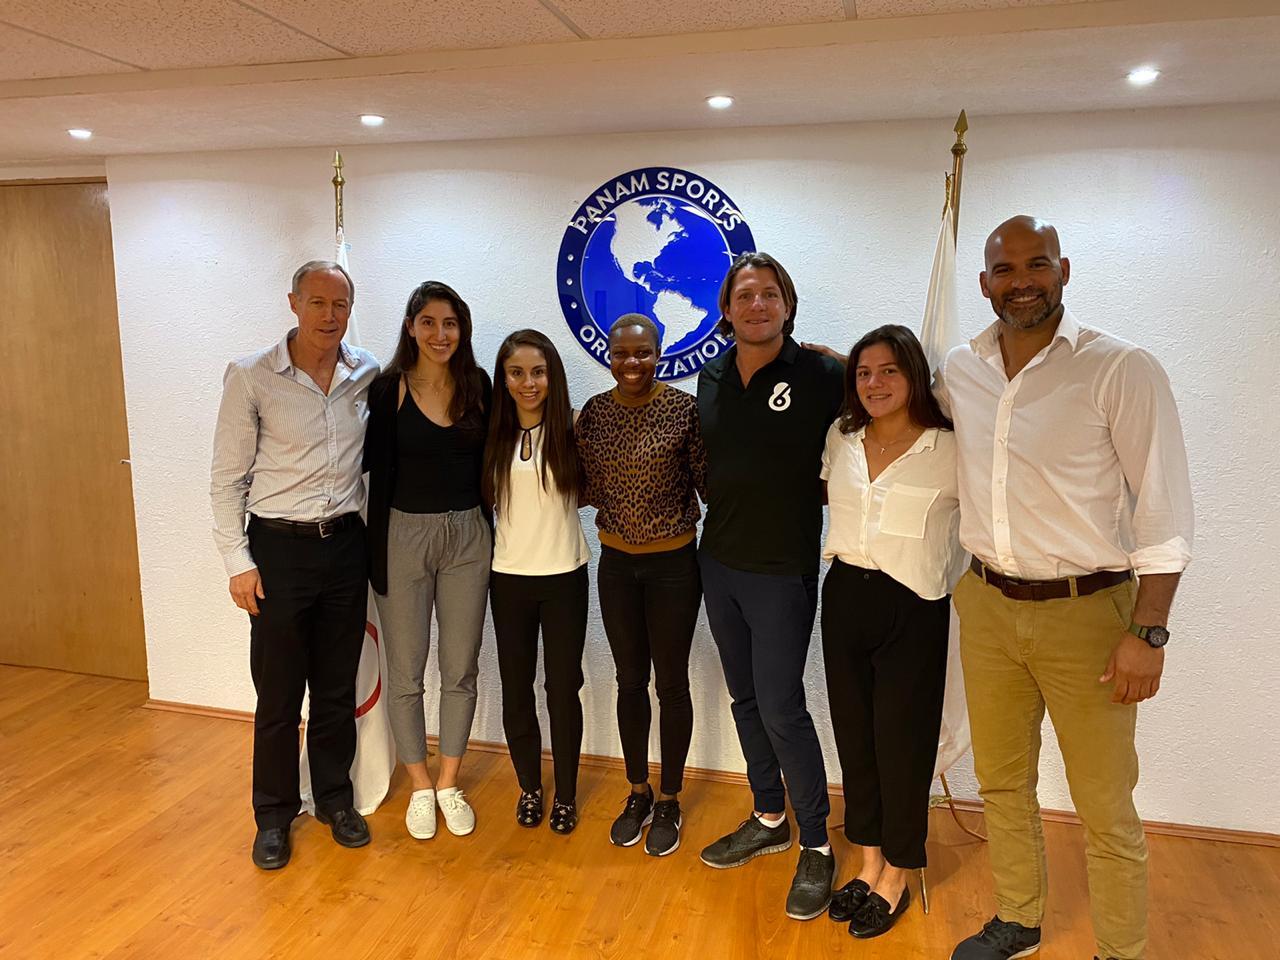 Aliann Pompey, nueva presidenta comisión atletas Panam Sports